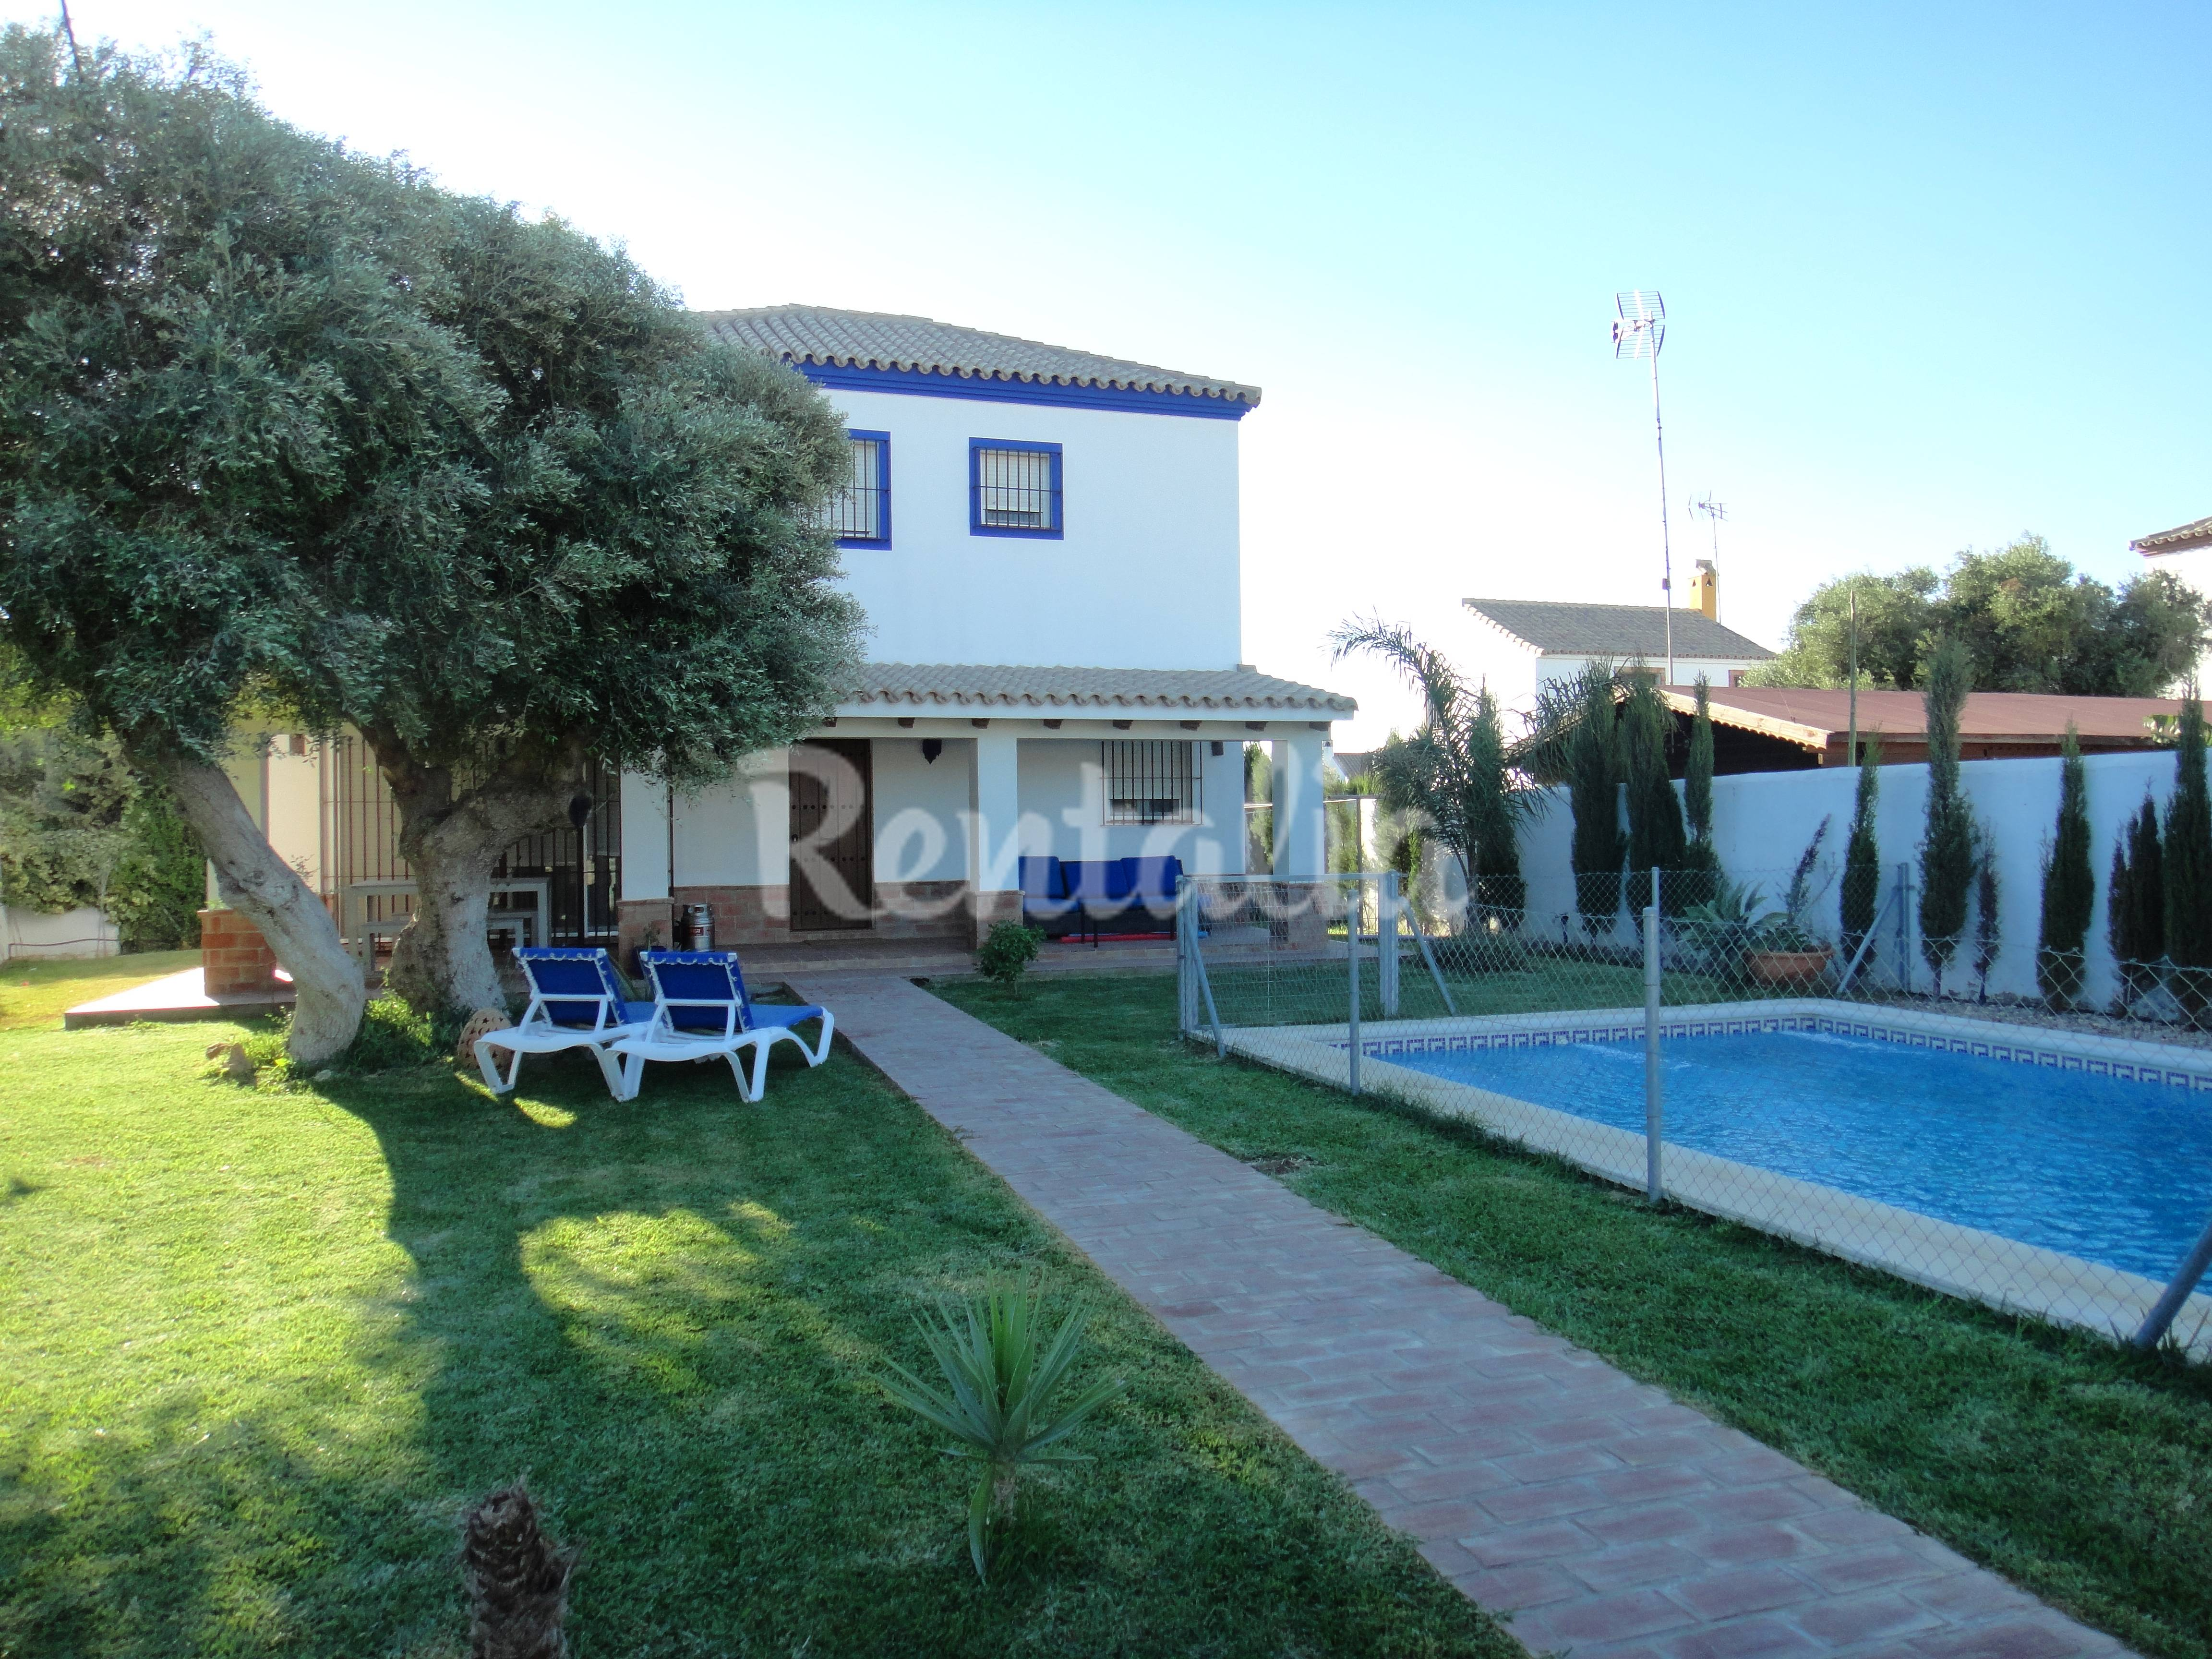 Casa con piscina privada parcela de 500 m2 zahora for Casas con piscina privada en cadiz